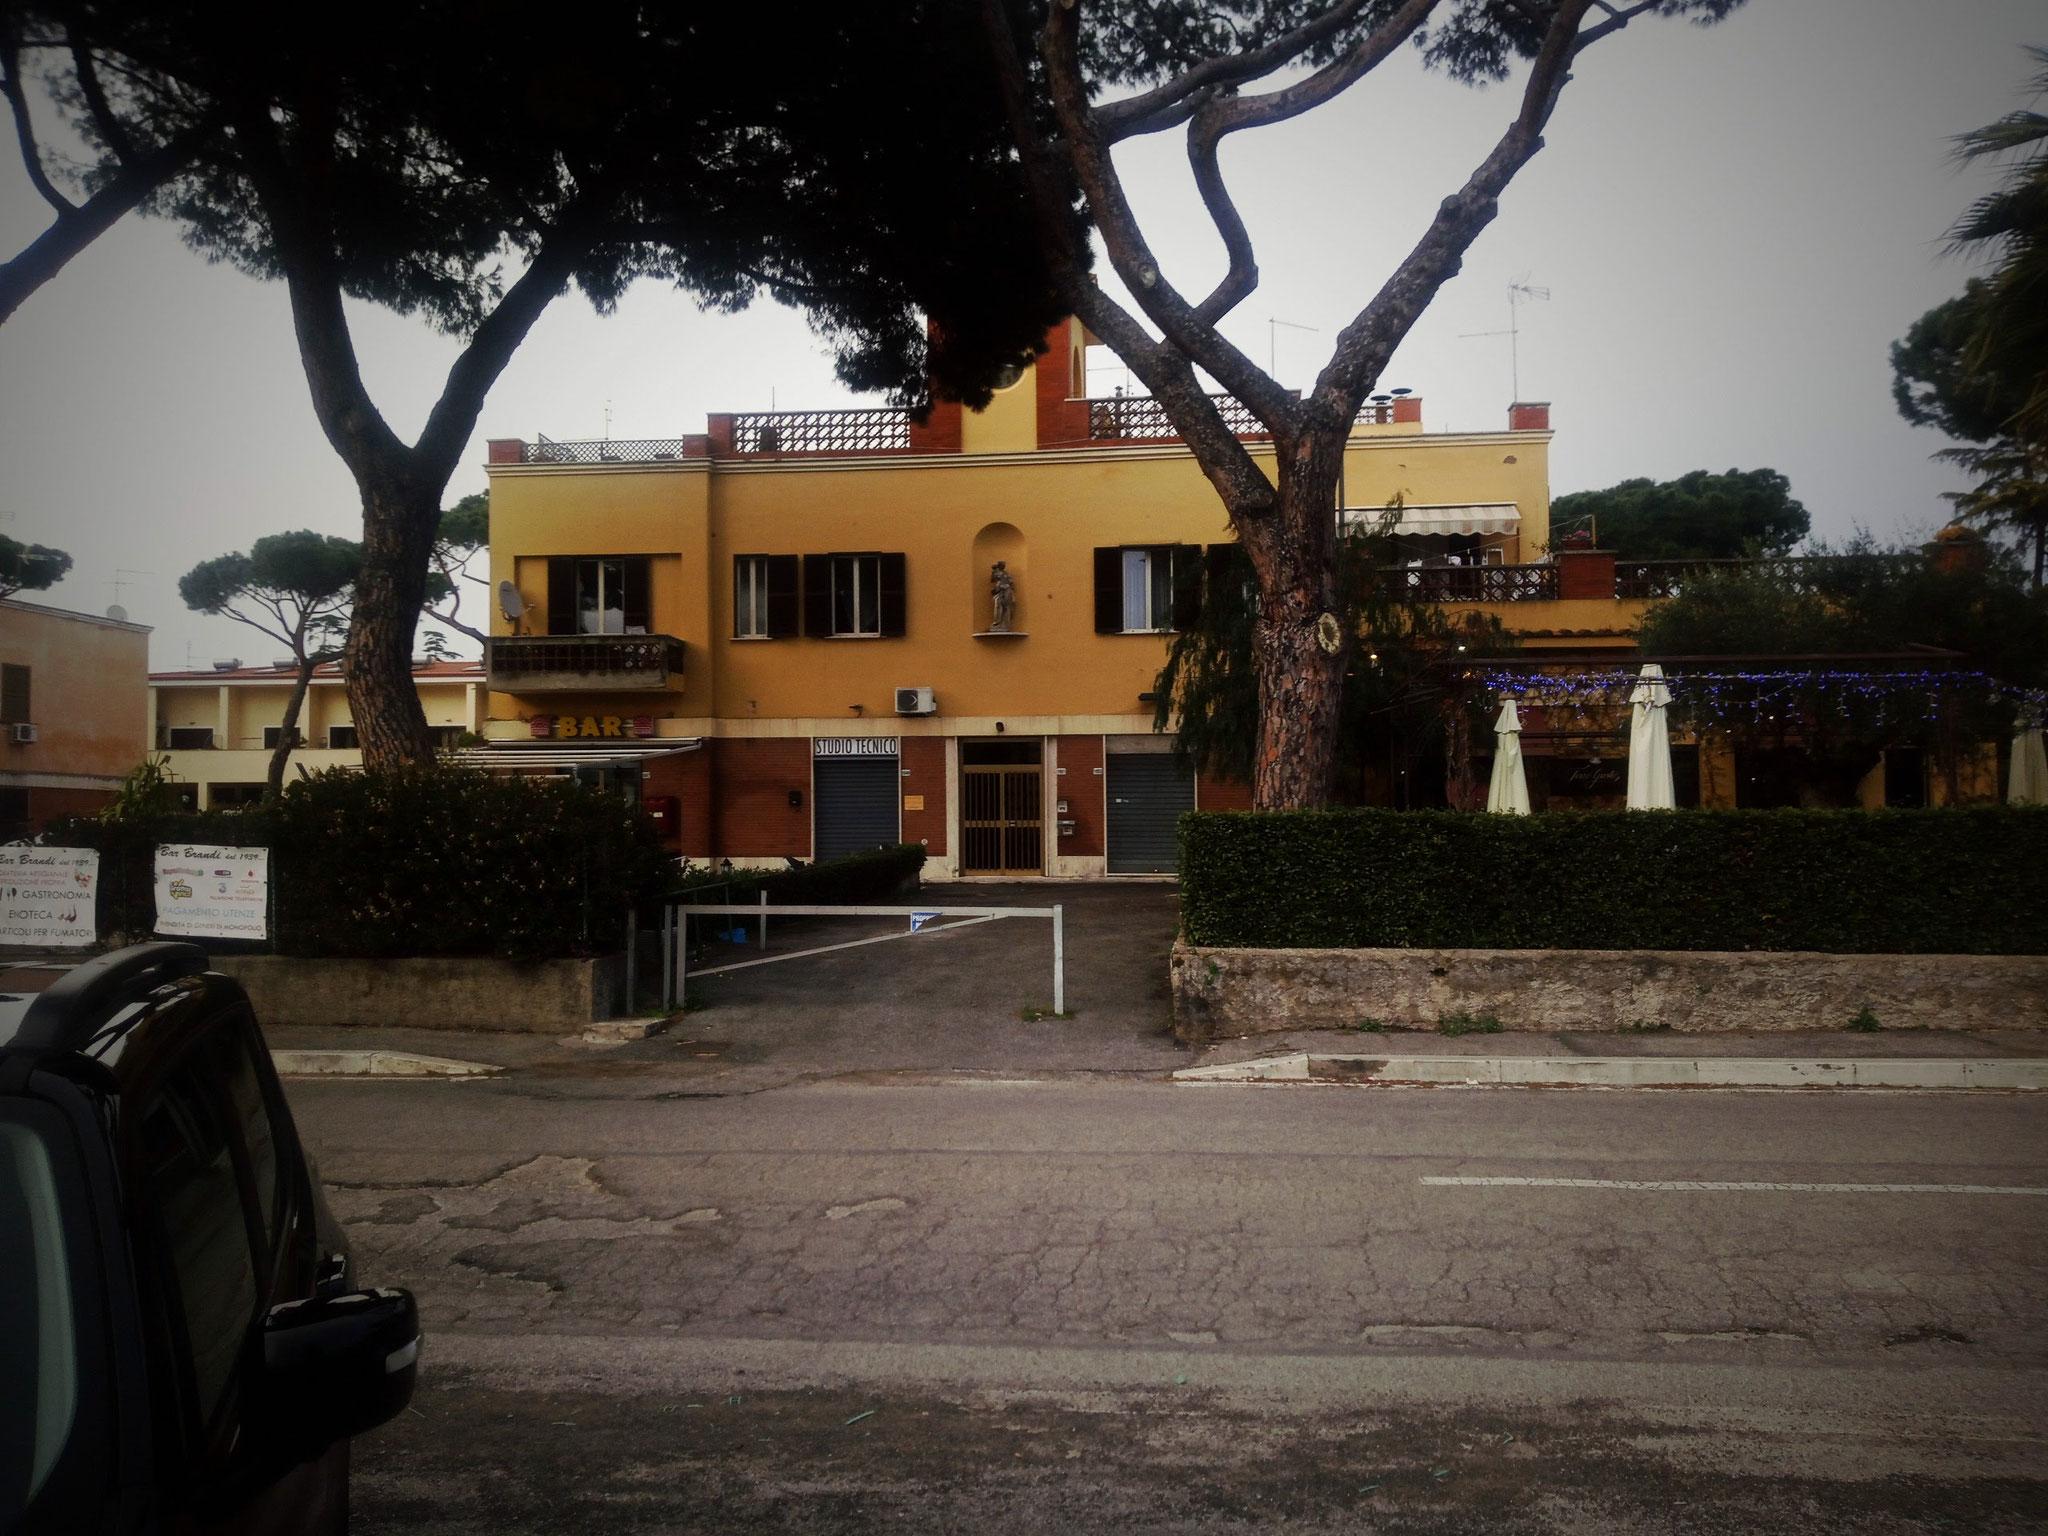 Studio Tecnico Palmieri di Palmieri Marco Via Appia Nuova 1049 - 00178 Roma